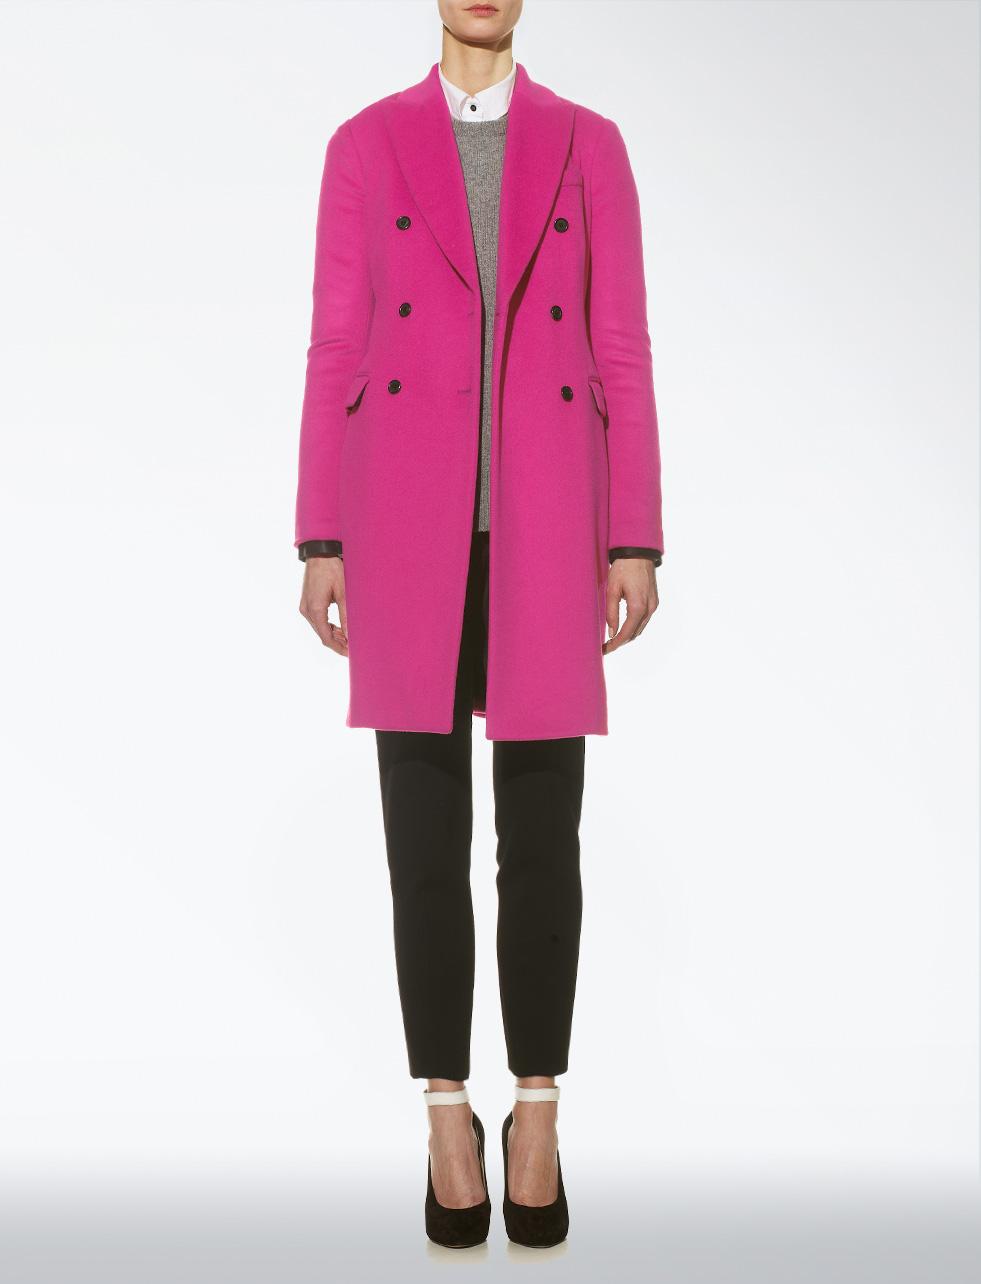 Fuschia Coat Images - Reverse Search